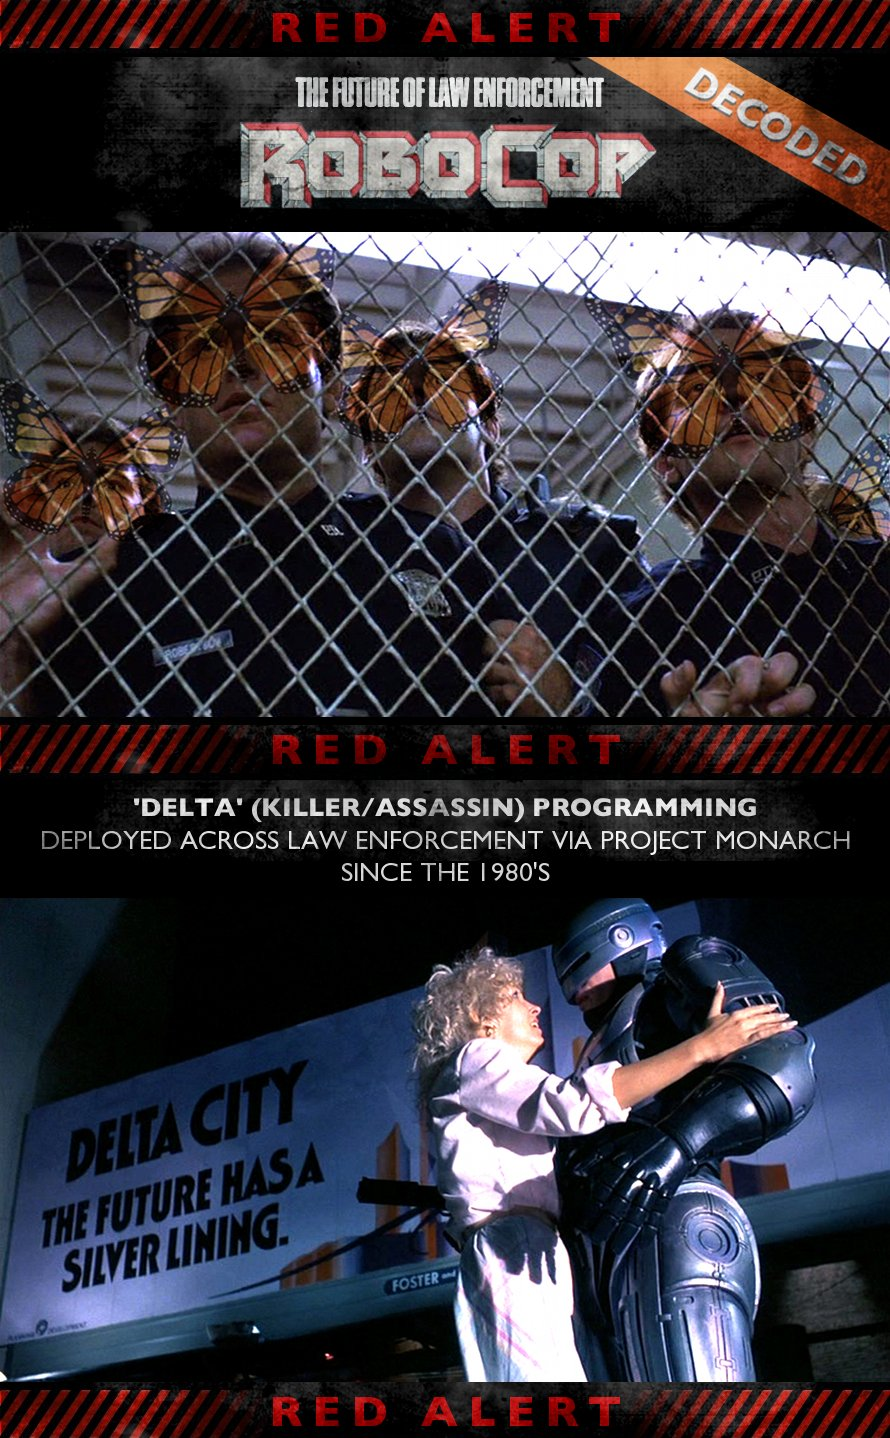 RoboCop (1987) - Decoded - Project Monarch